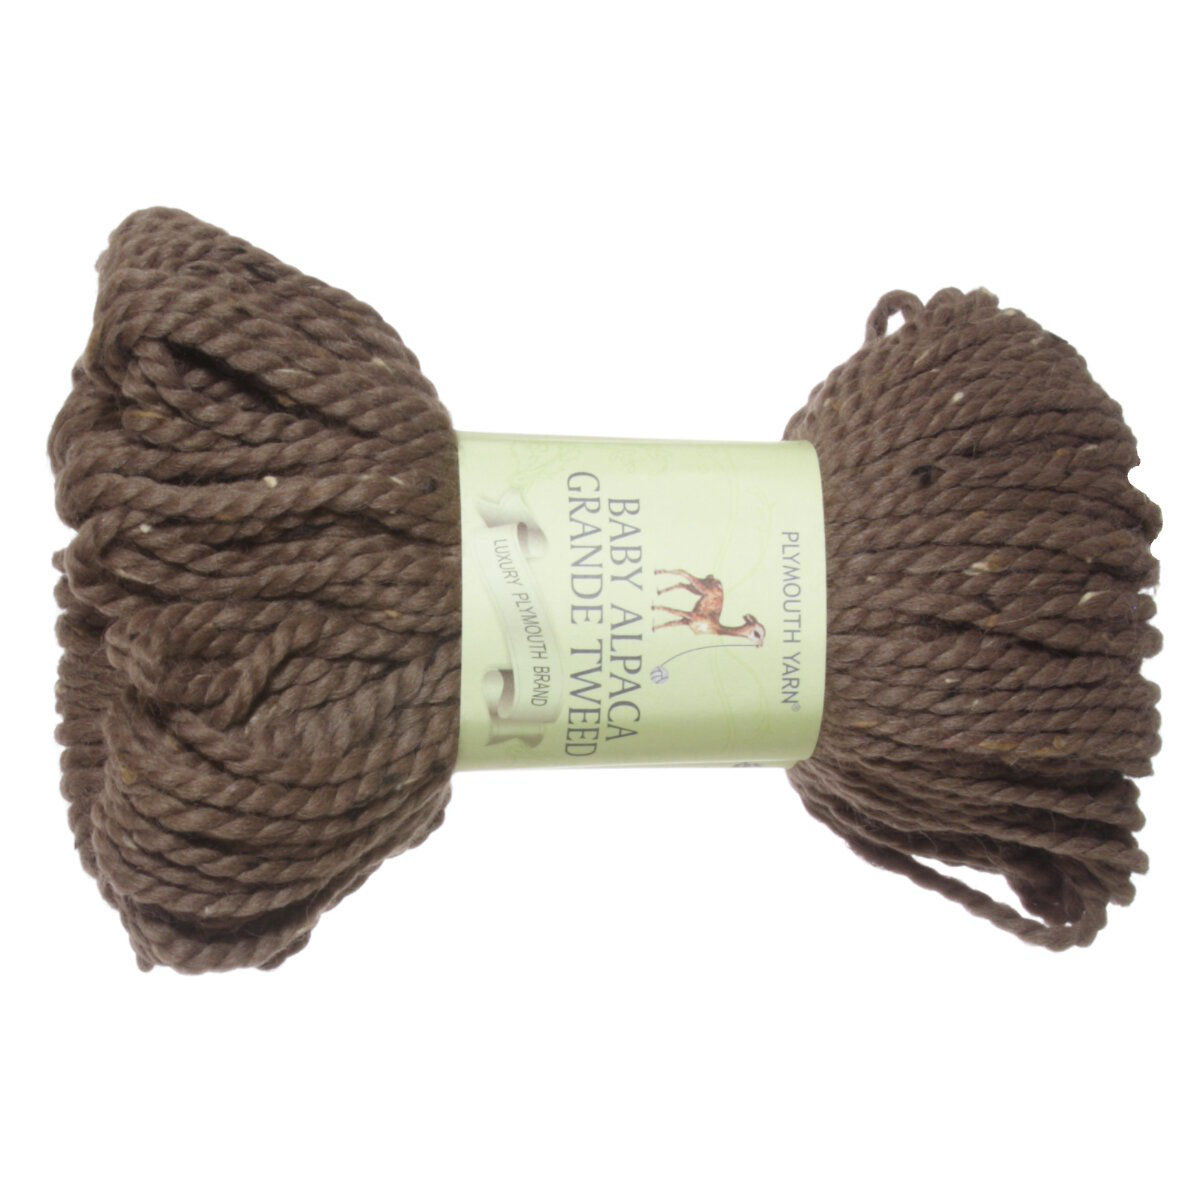 Plymouth Yarn Baby Alpaca Grande Tweed Yarn 3249 At